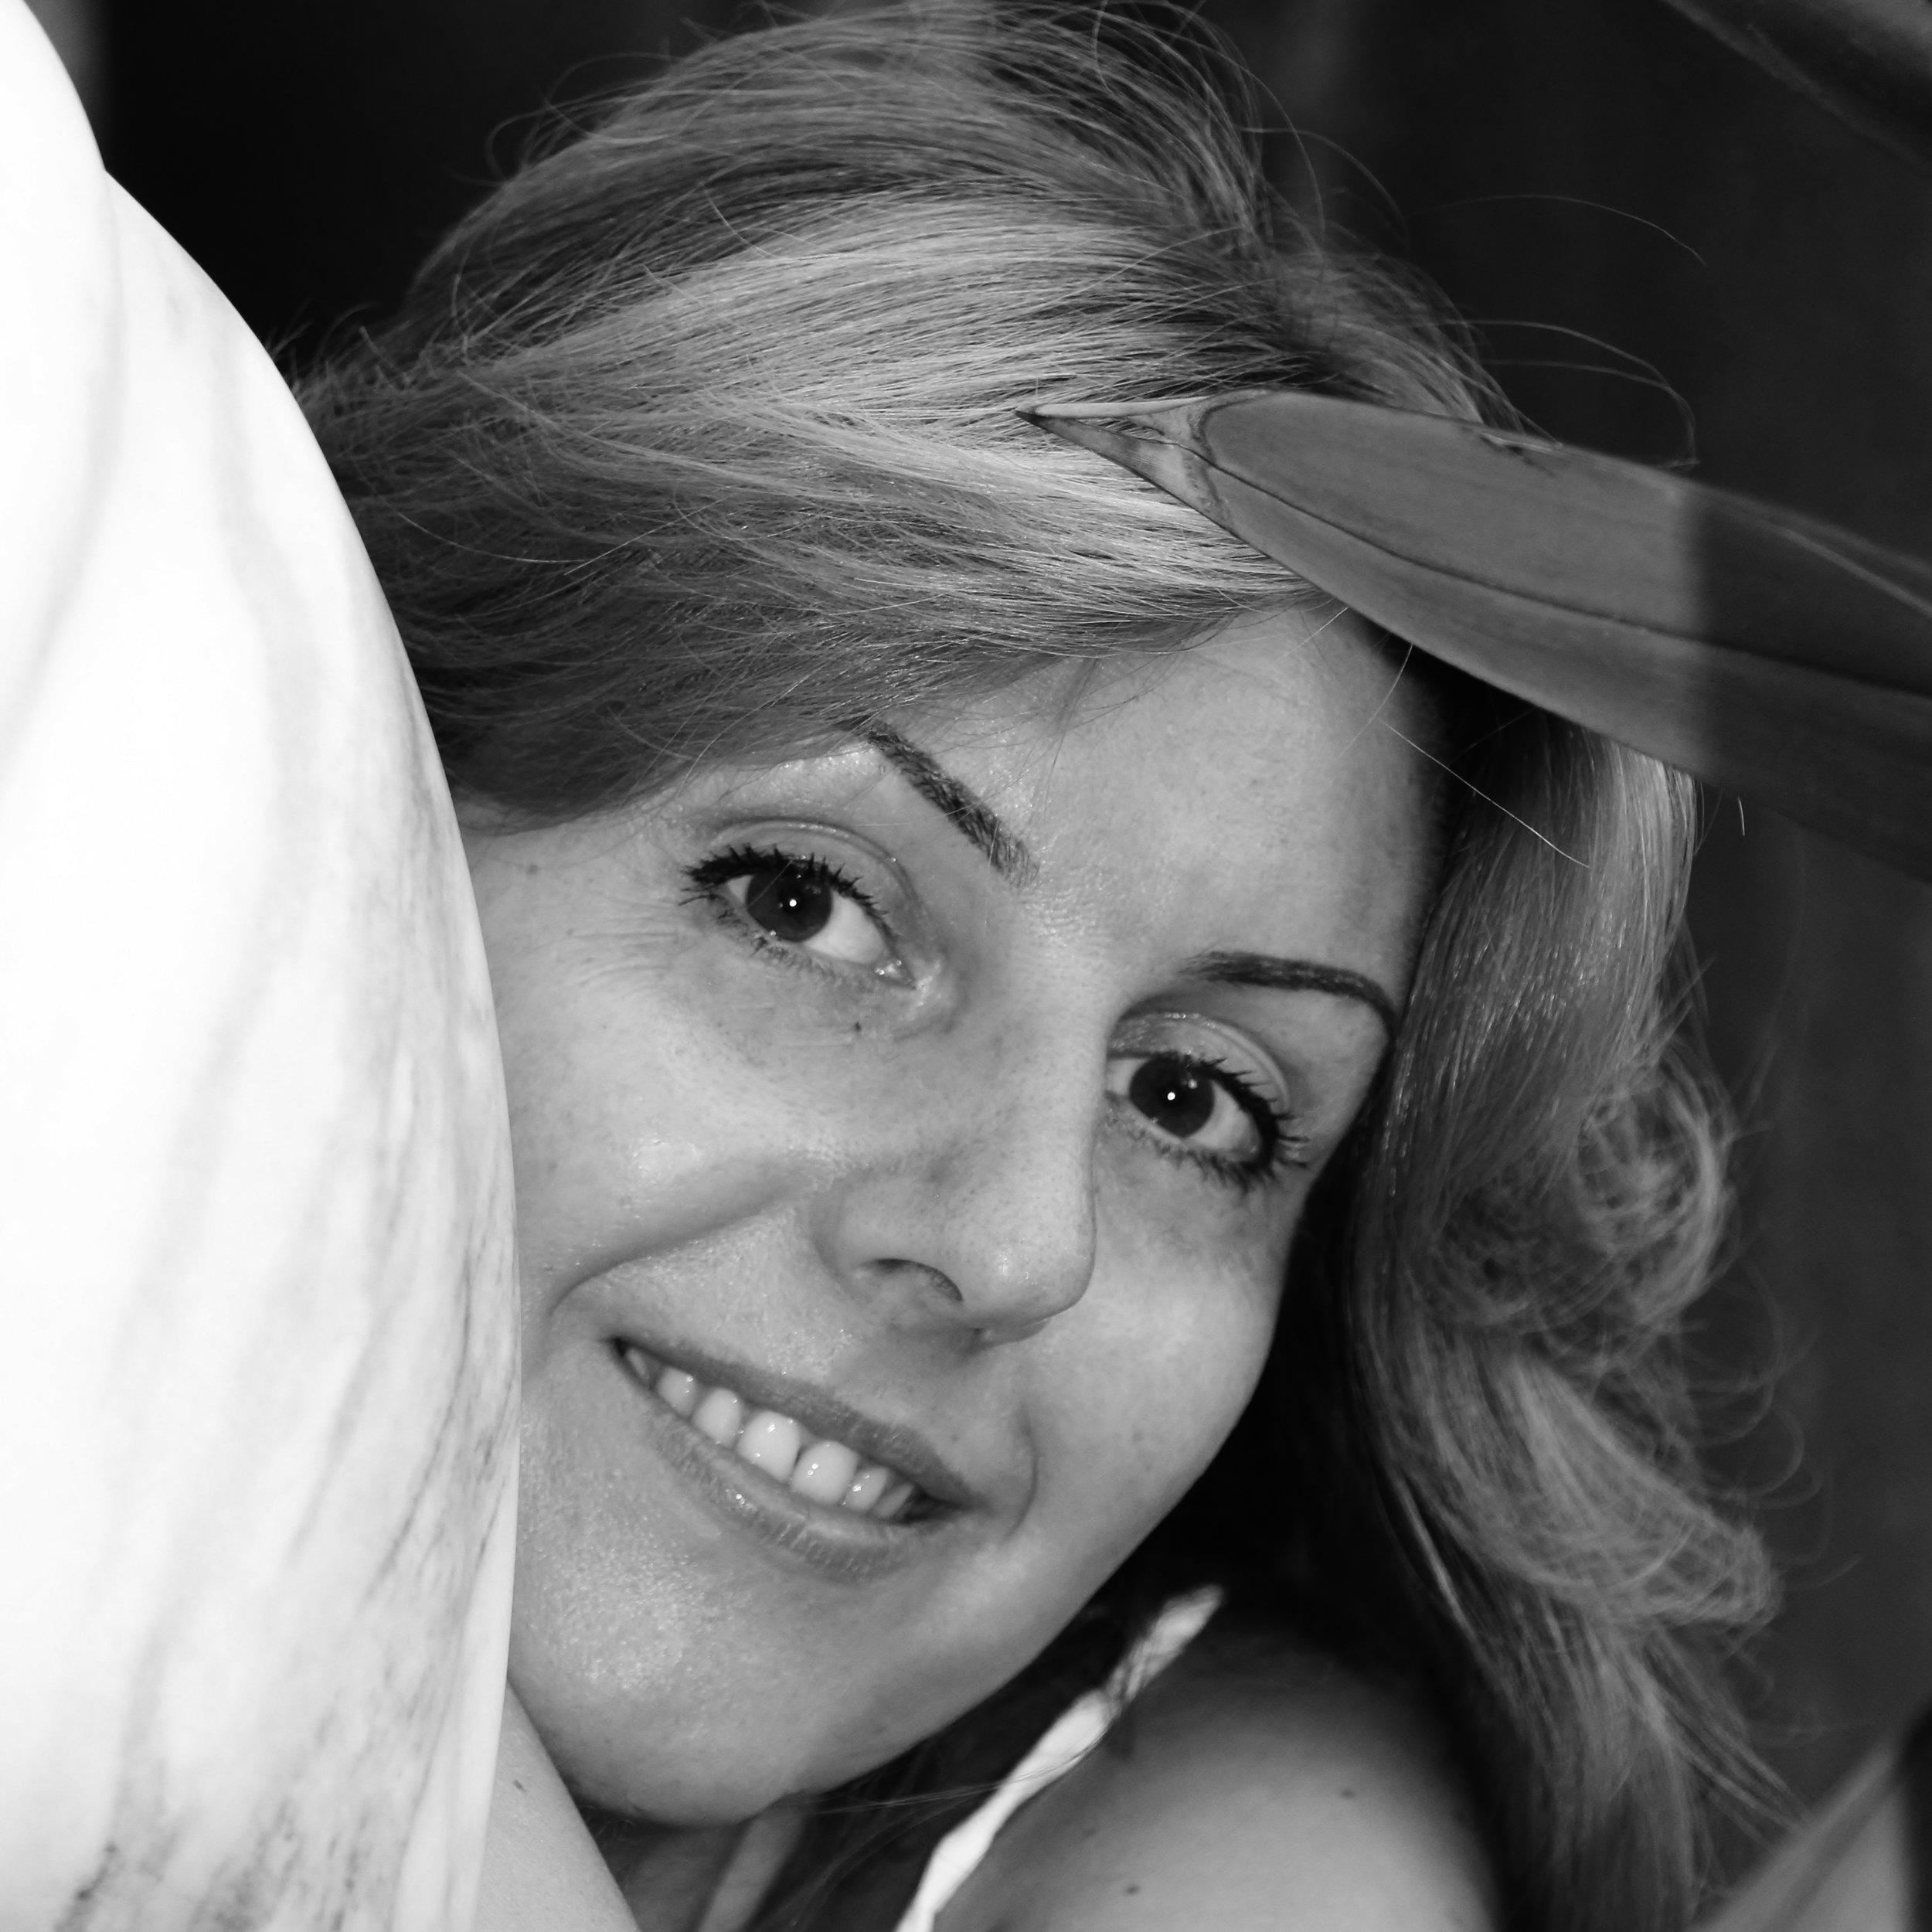 Alexandra Hofer - Theaterpädagogin, Regisseurin, Schauspielerin